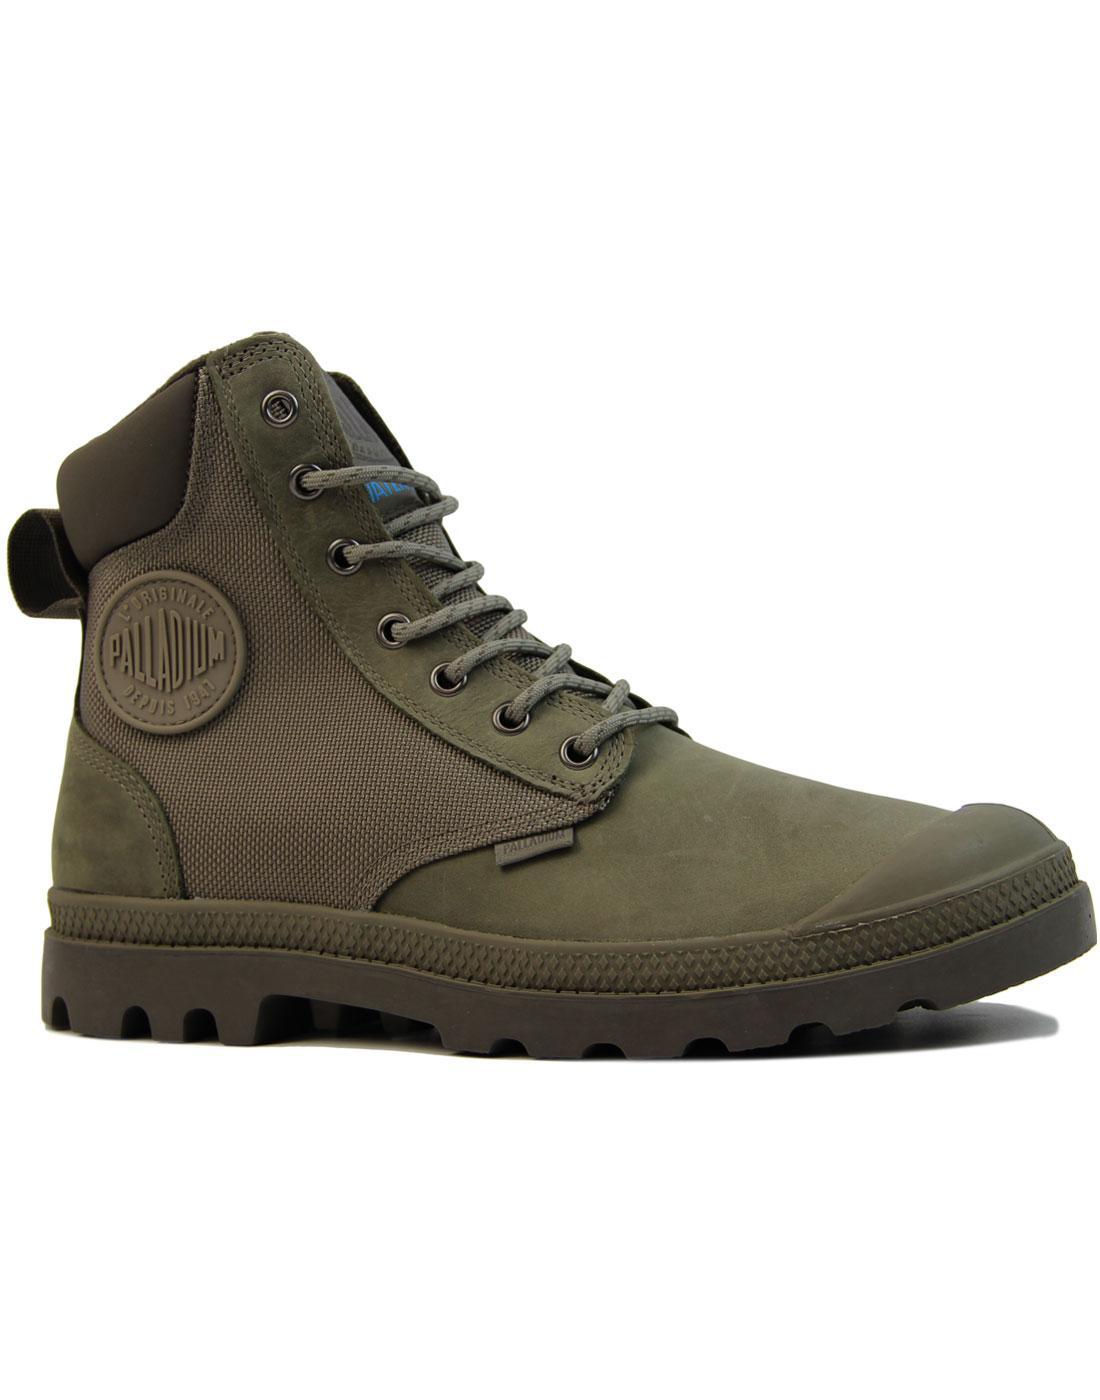 Pampa Sport Cuff WPN PALLADIUM Waterproof Boots FR